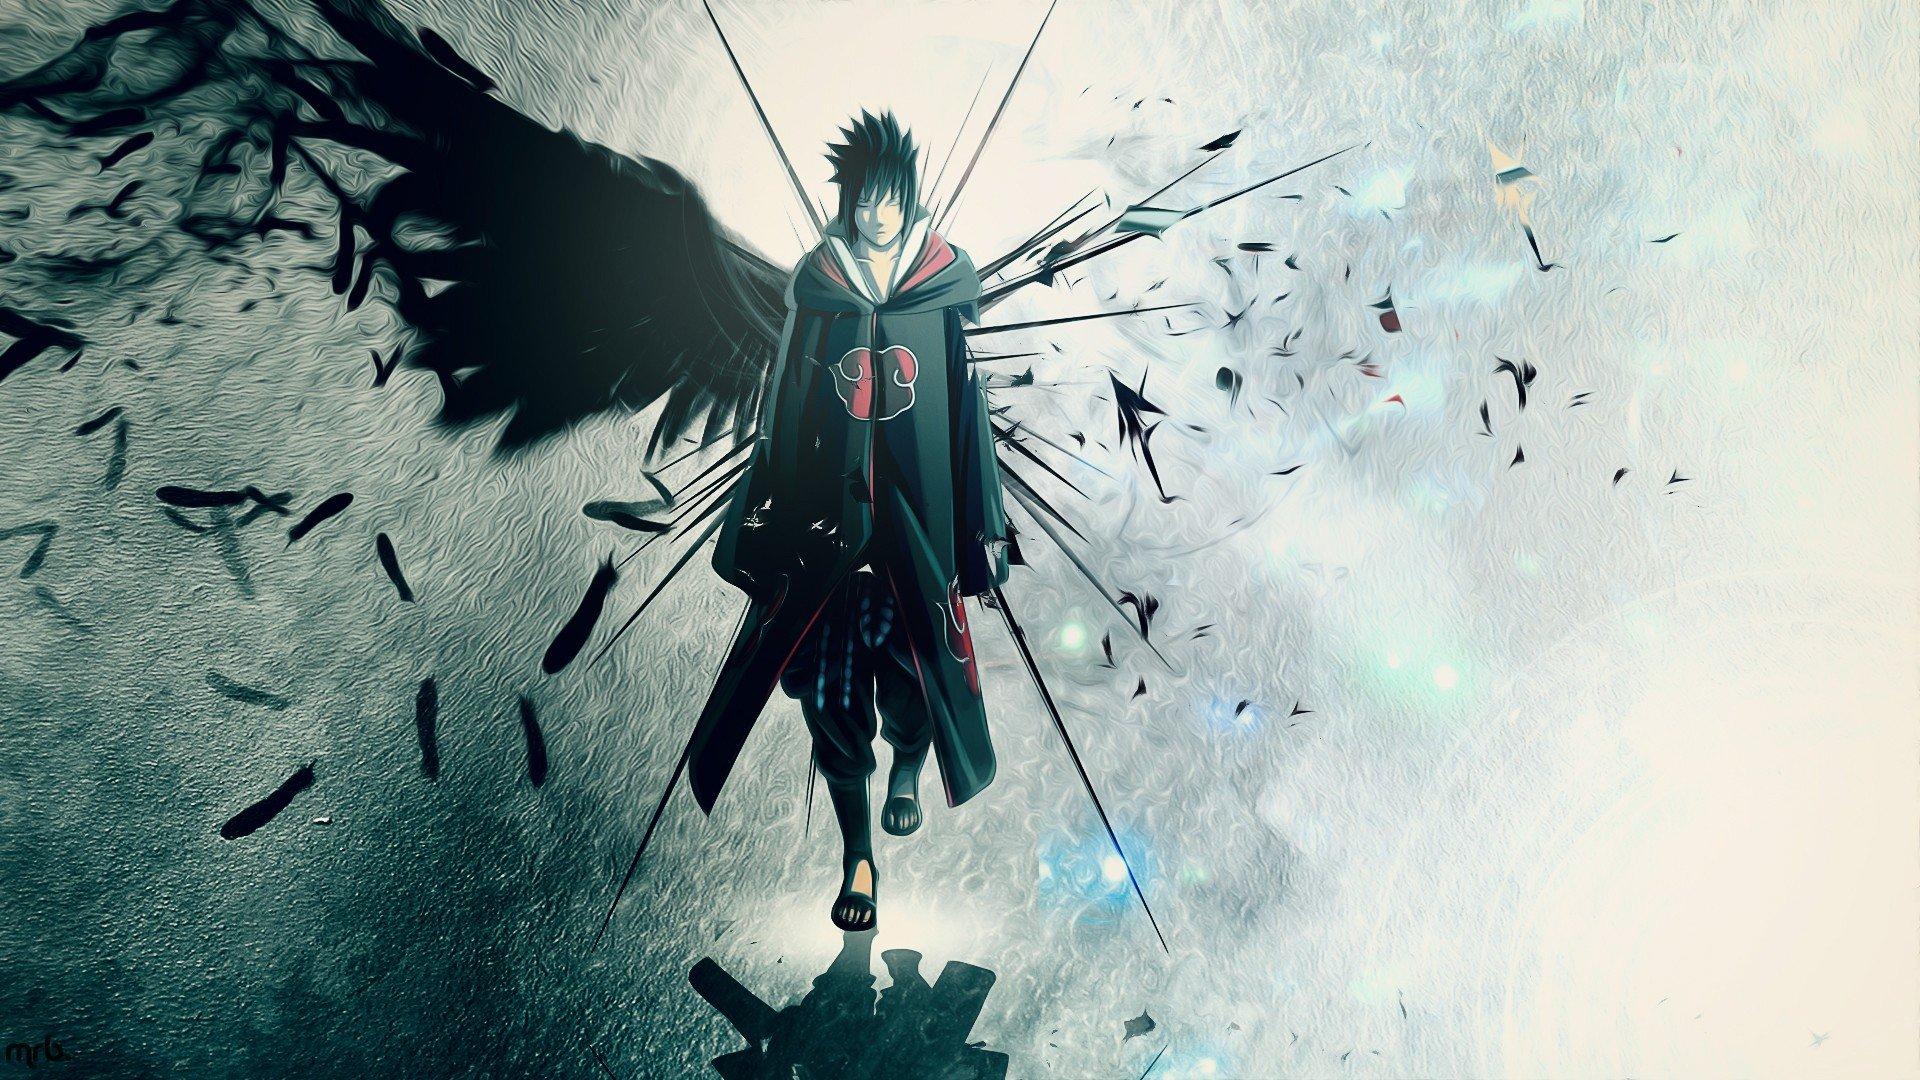 wings uchiha sasuke naruto shippuden akatsuki feathers